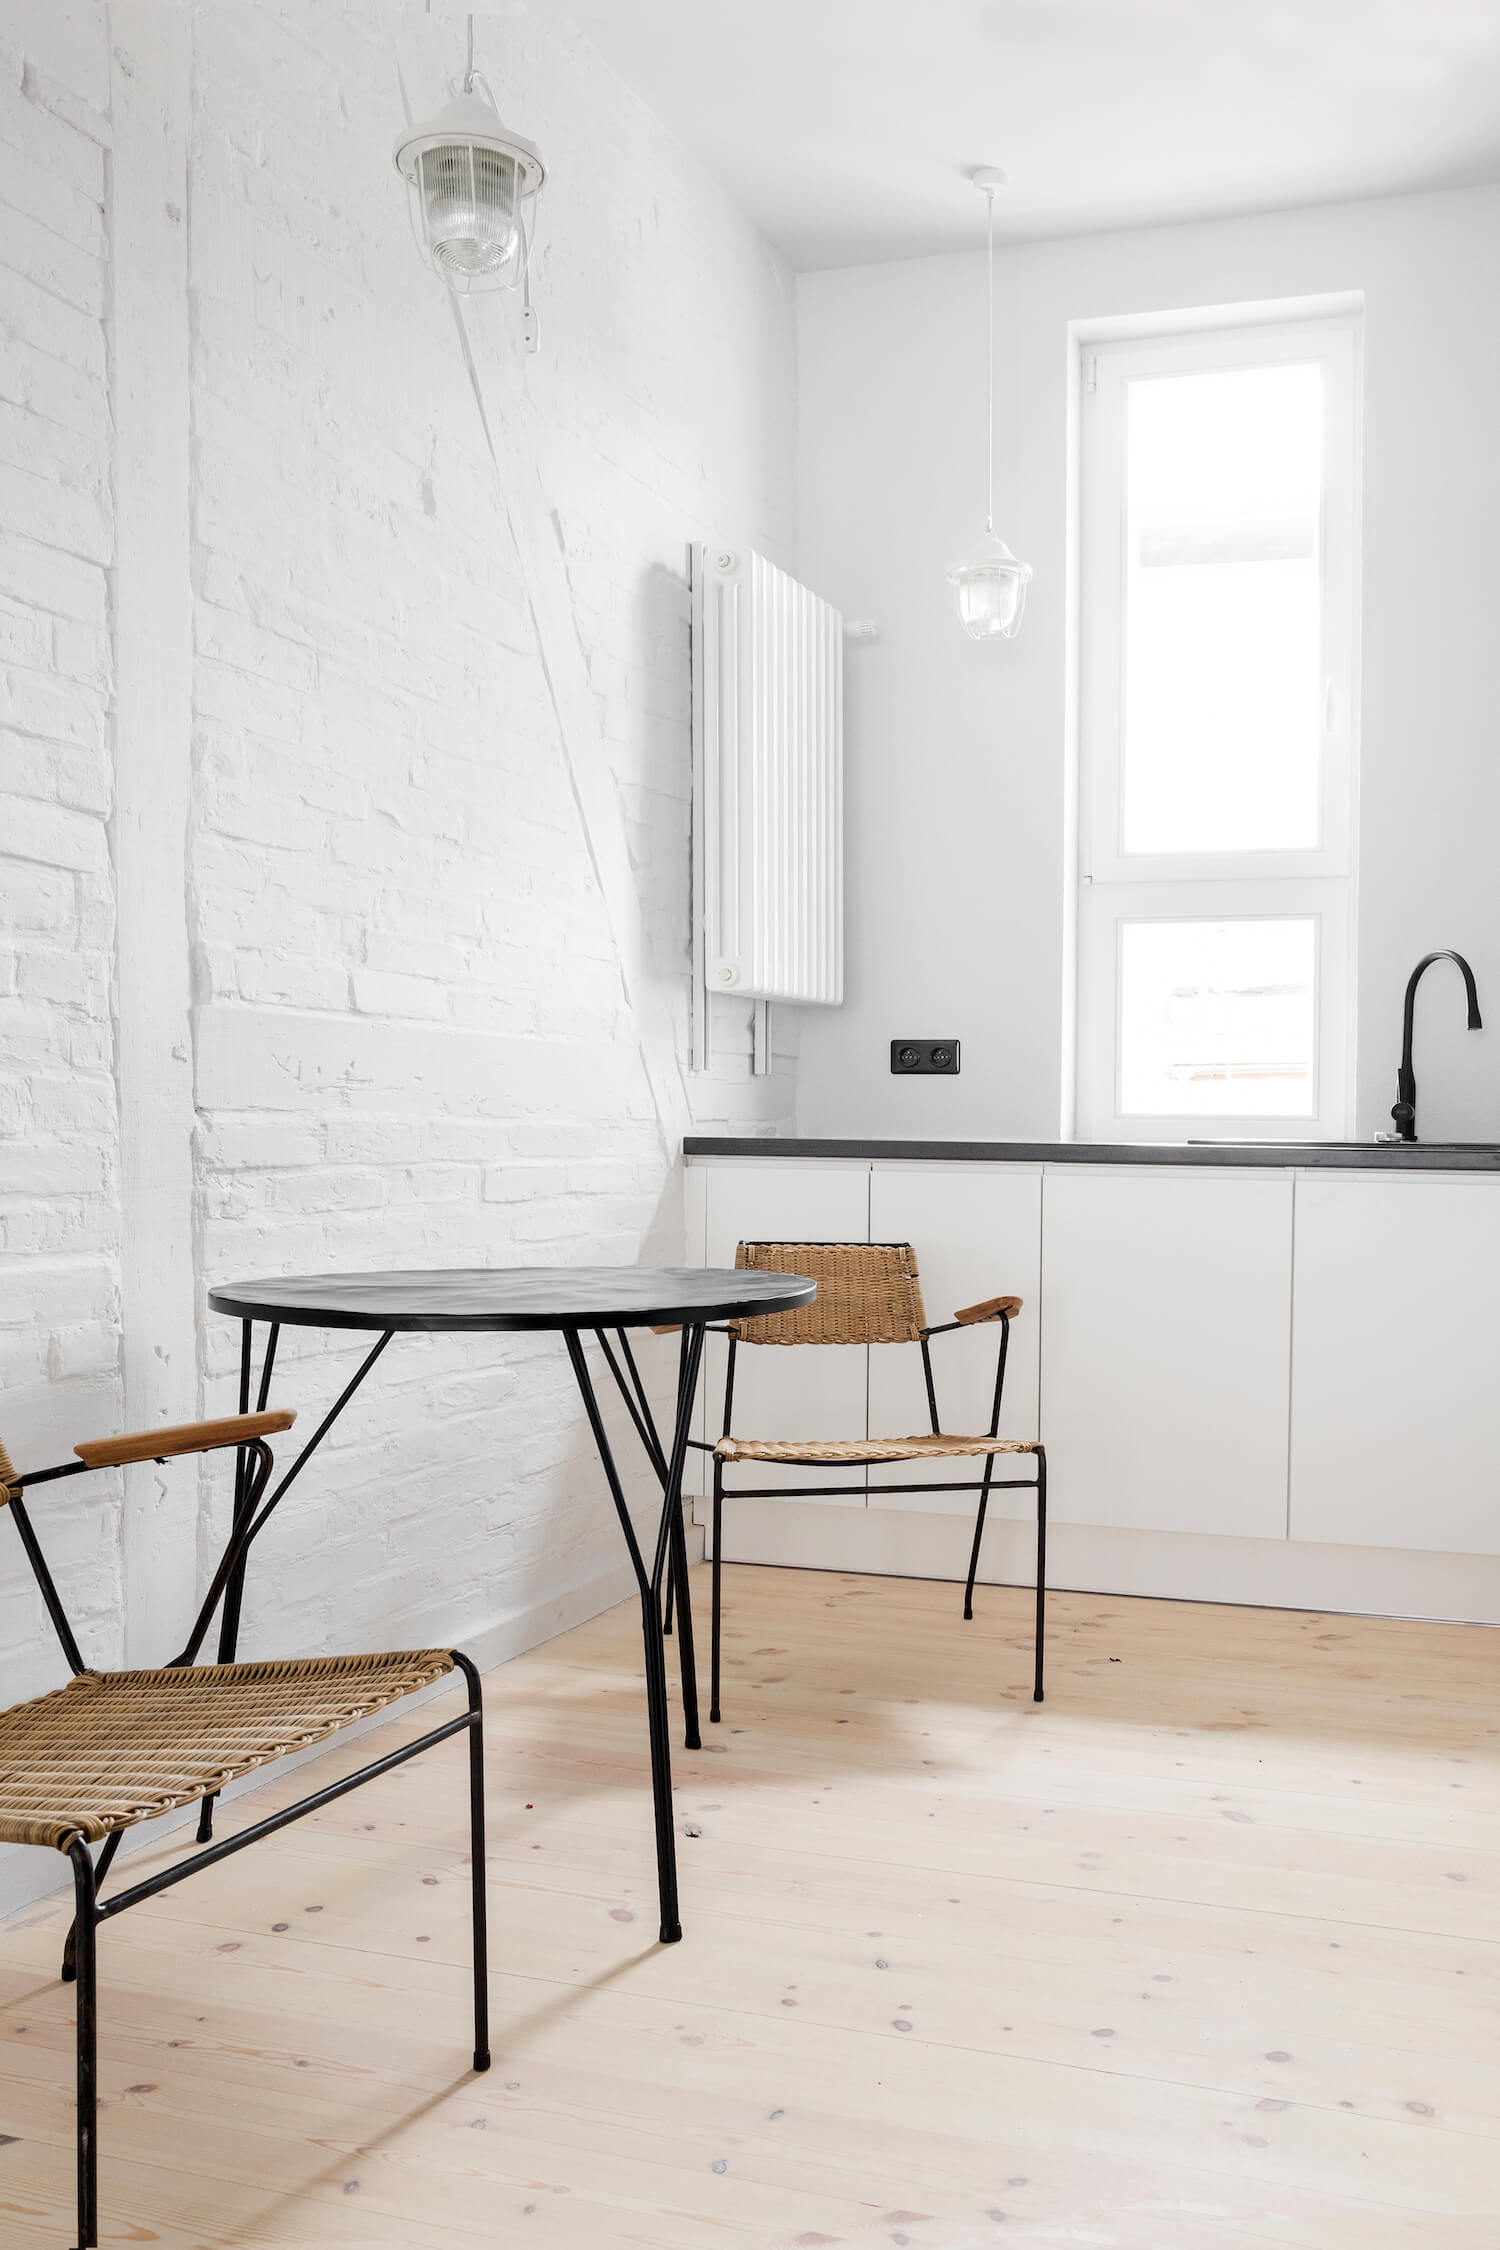 est living loft kolasinski polish holiday apartment 3